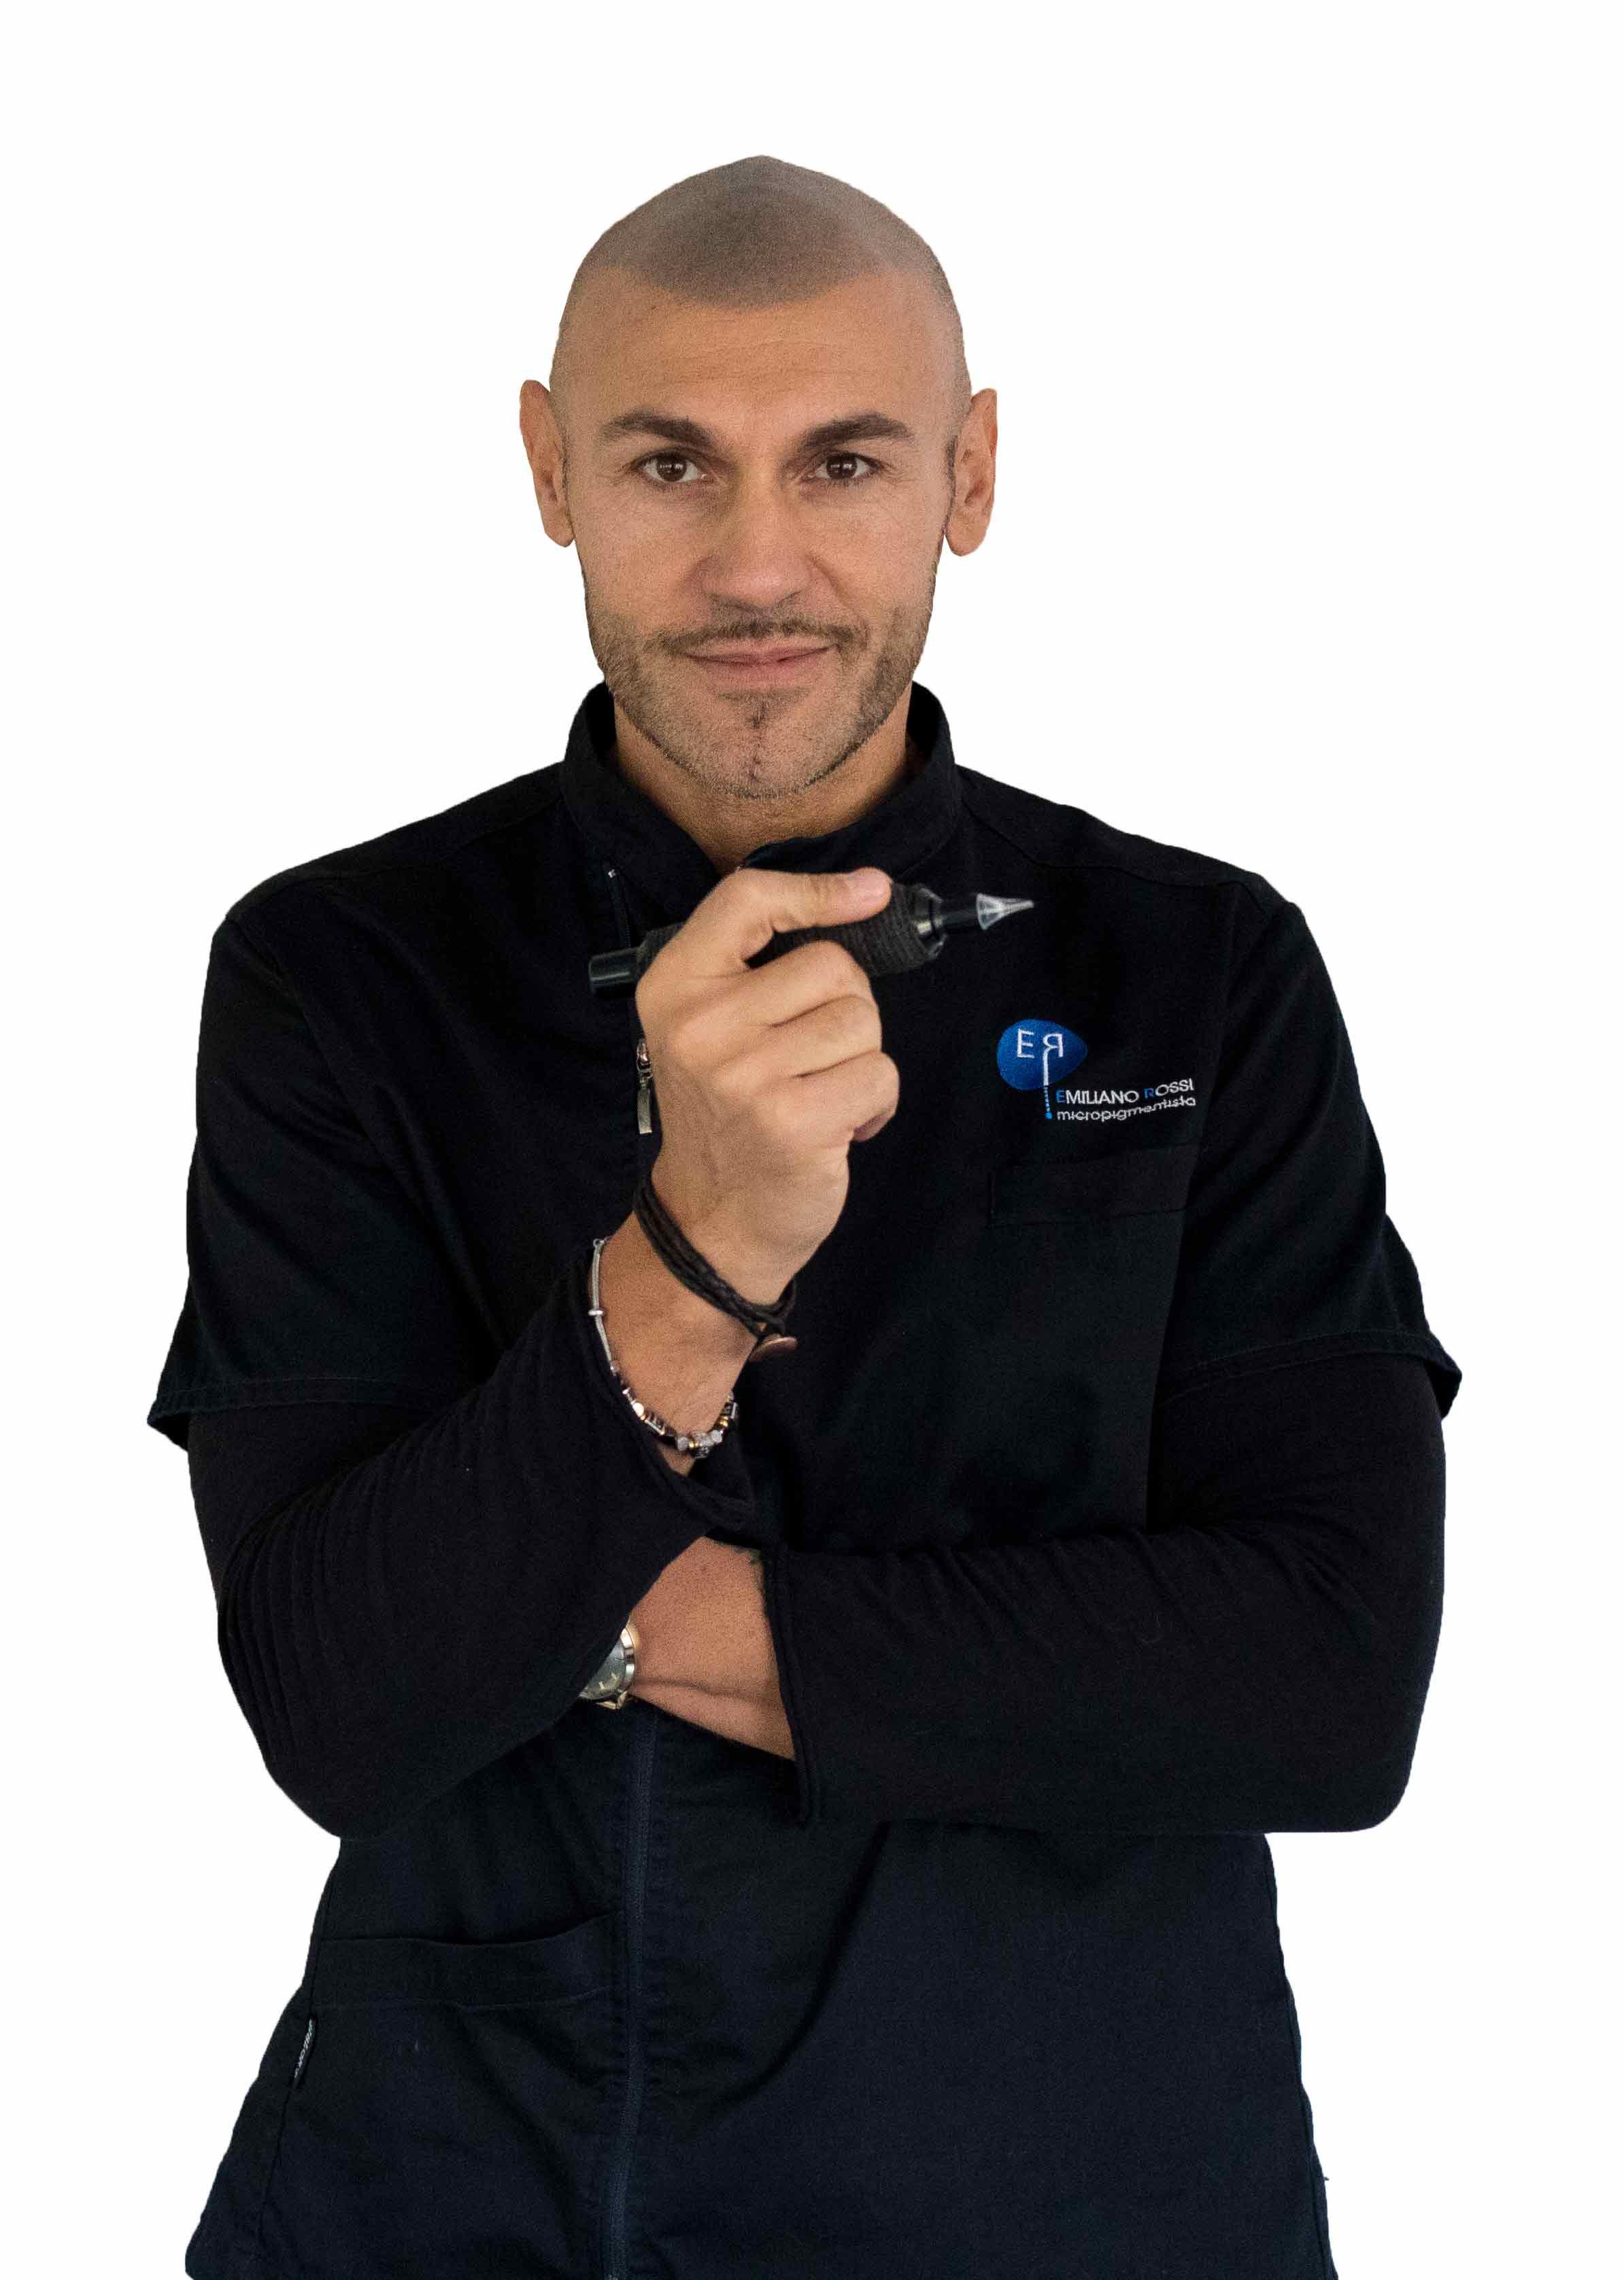 Emiliano-Rossi